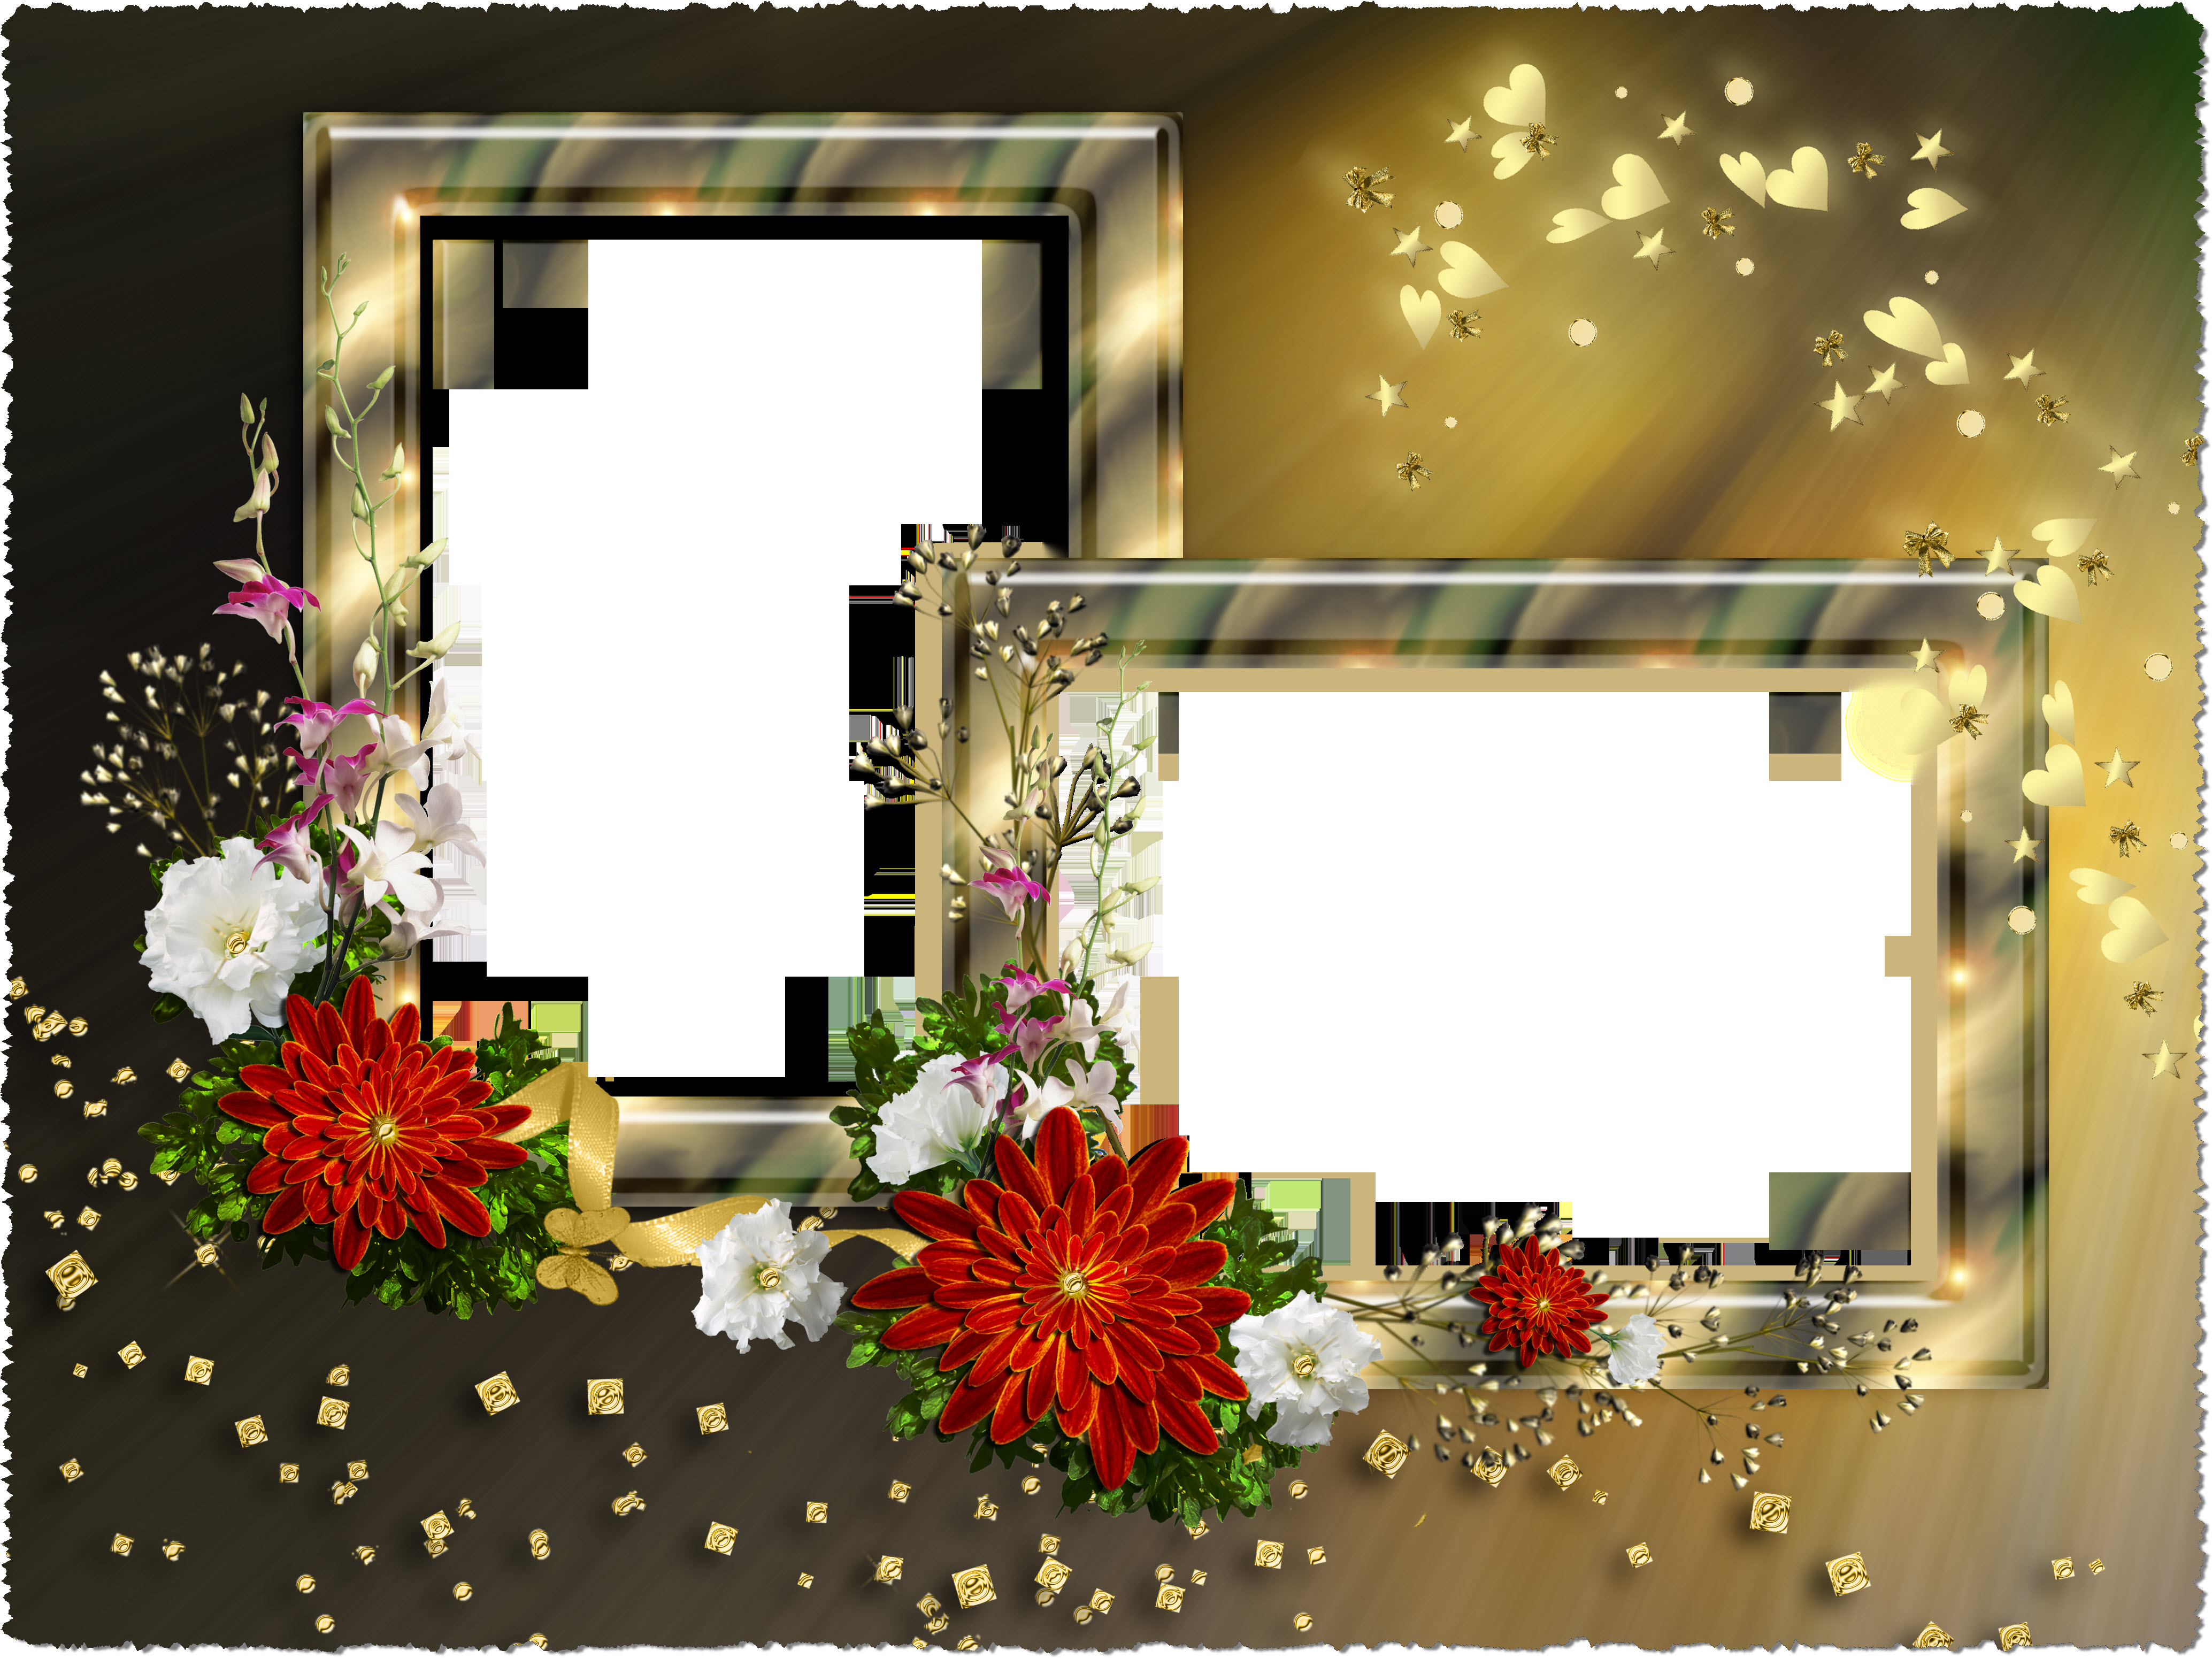 frames for photoshop